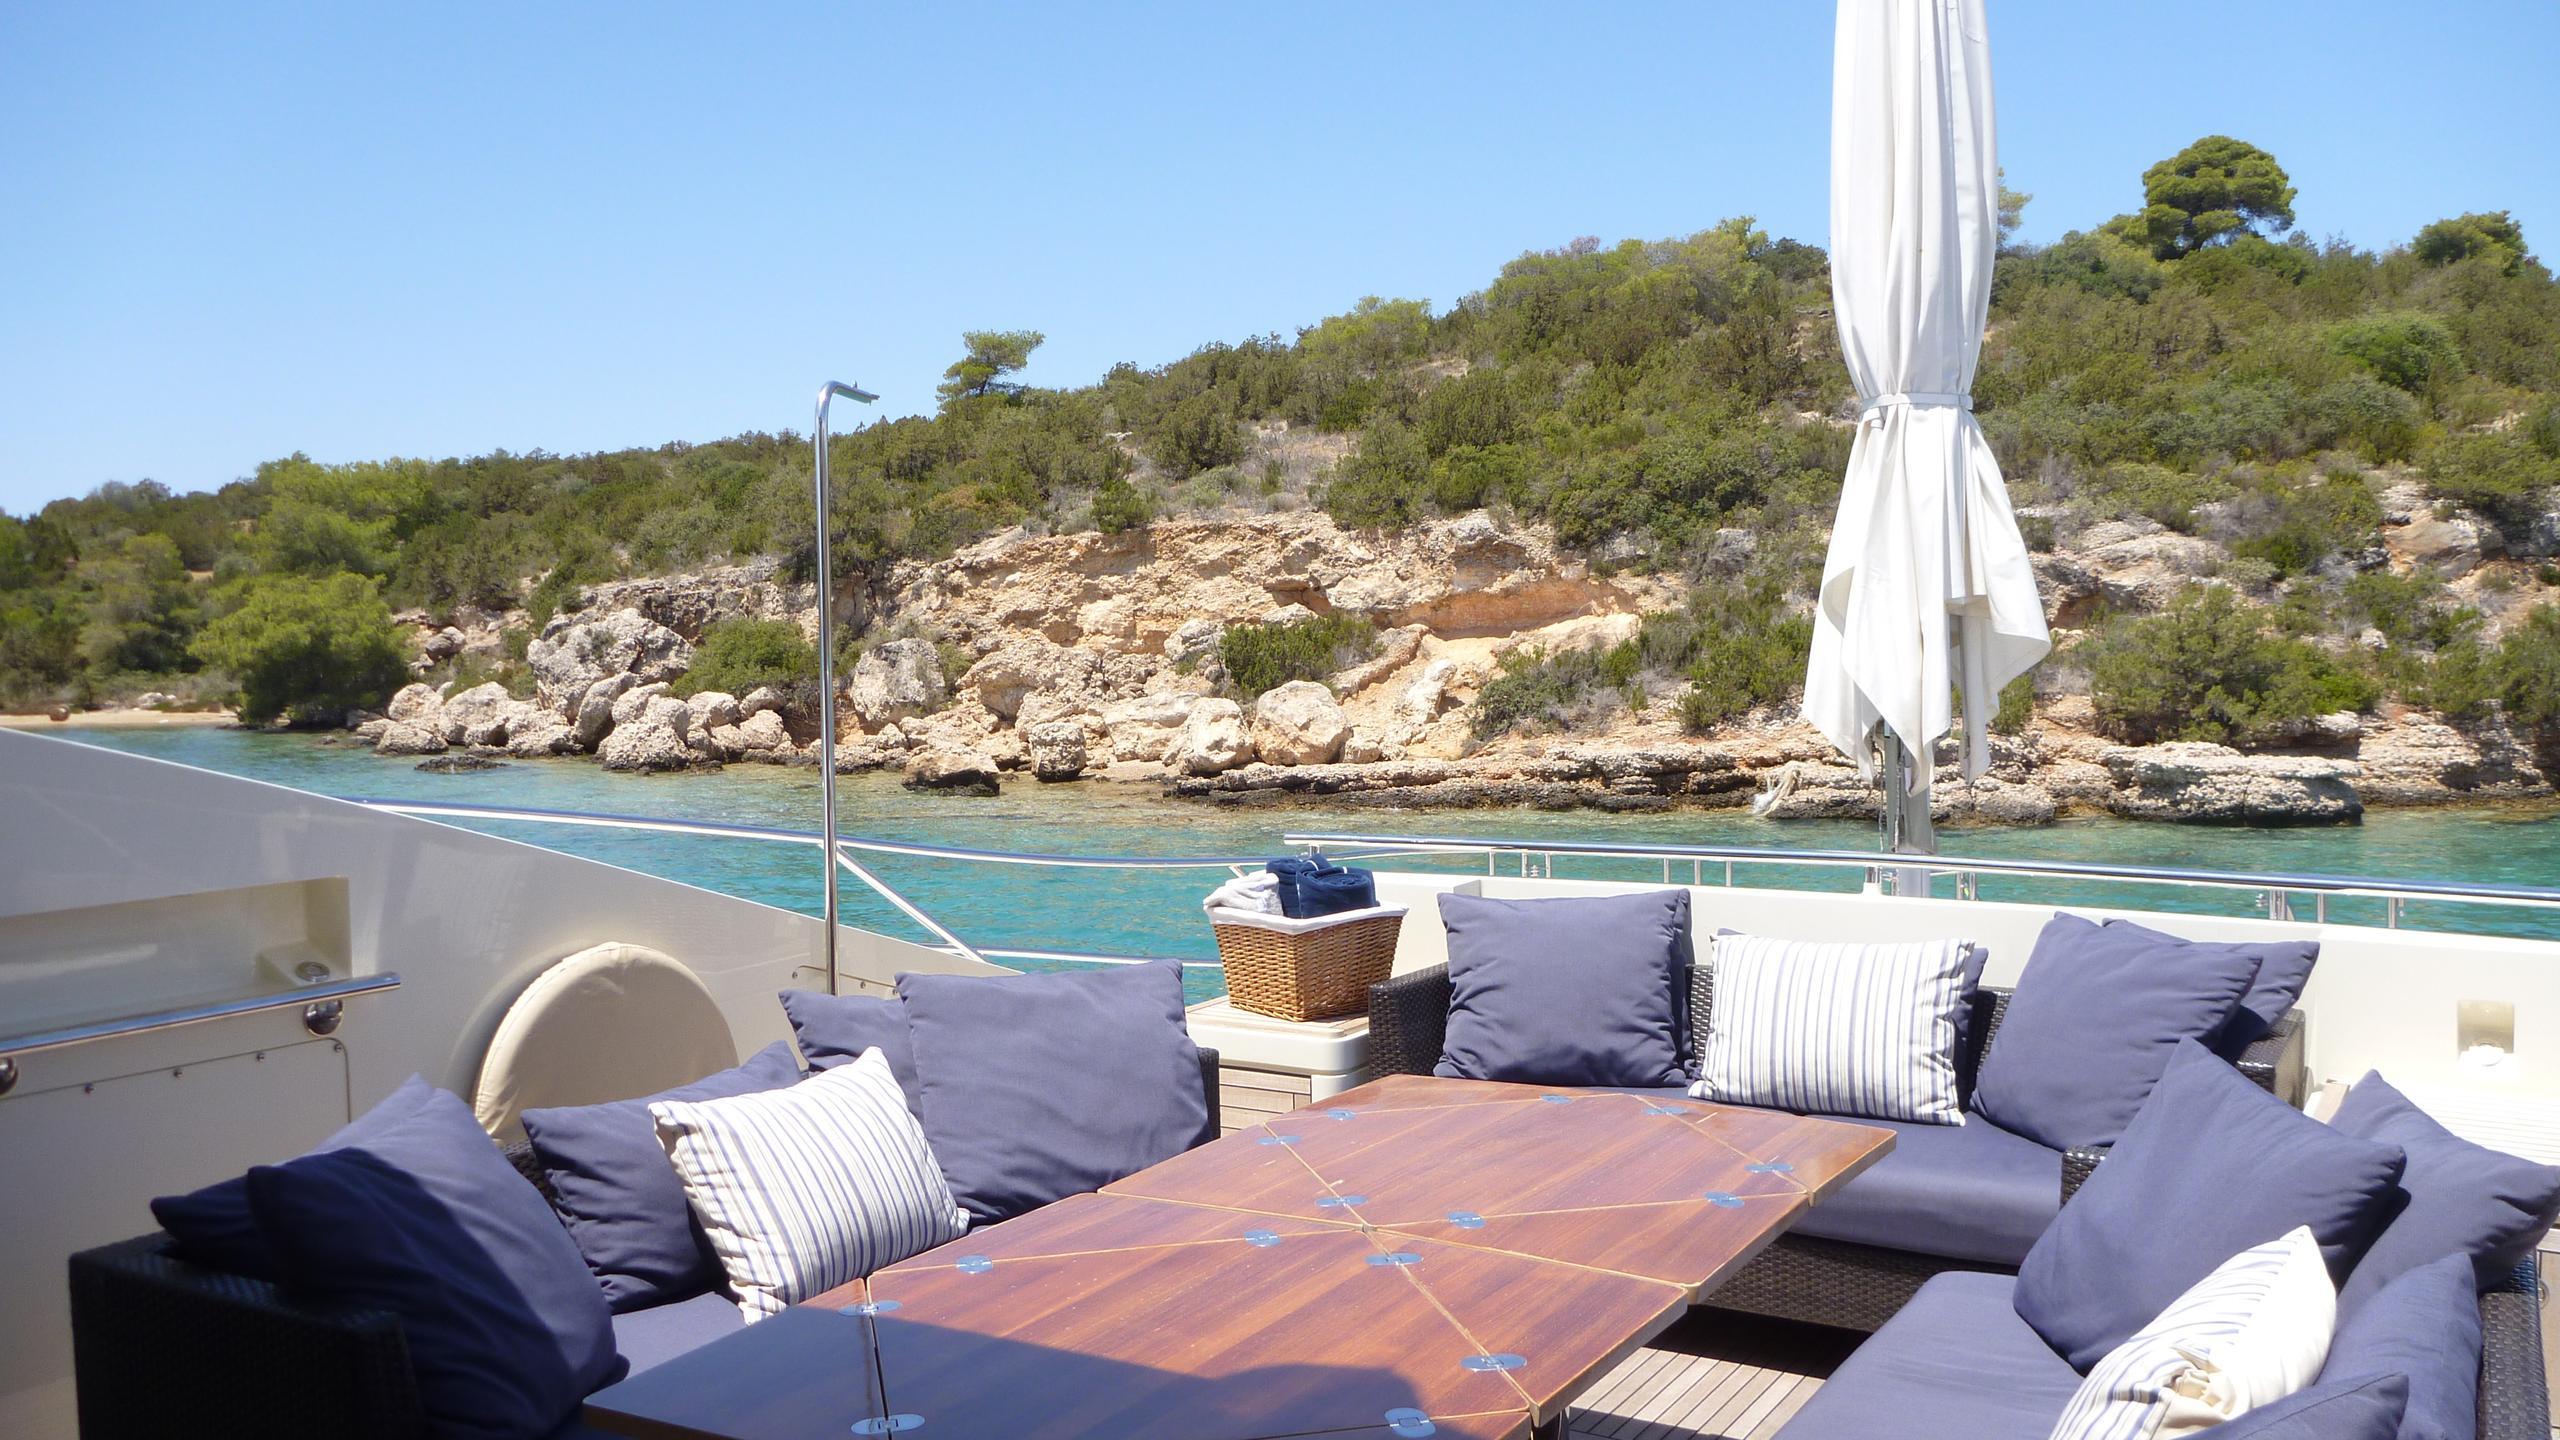 vanquish-yacht-aft-deck